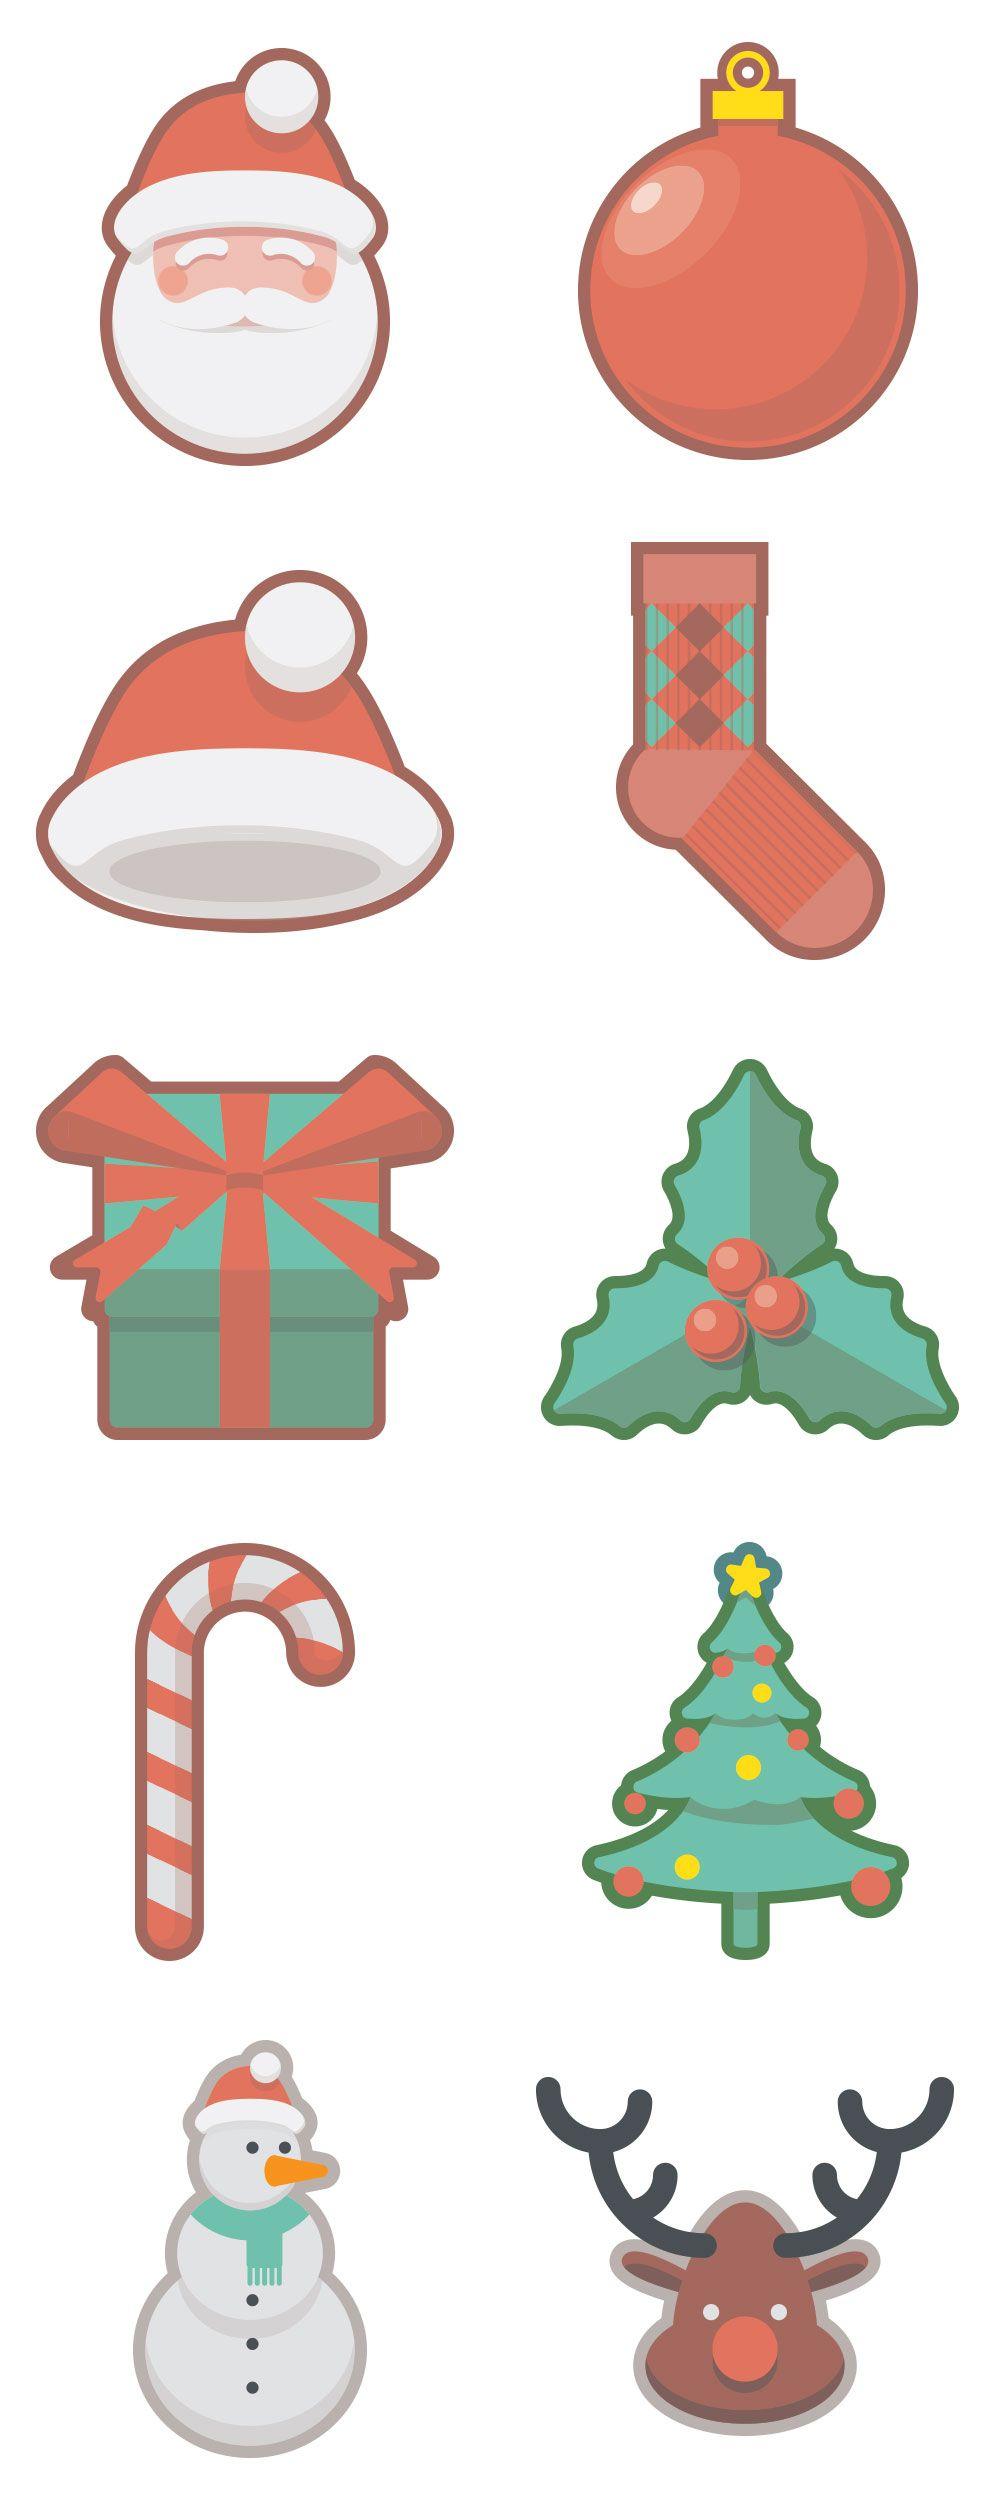 Christmas Holidays Icon.Christmas Holidays Free Icon Set 11 Mb Oxygenna Com